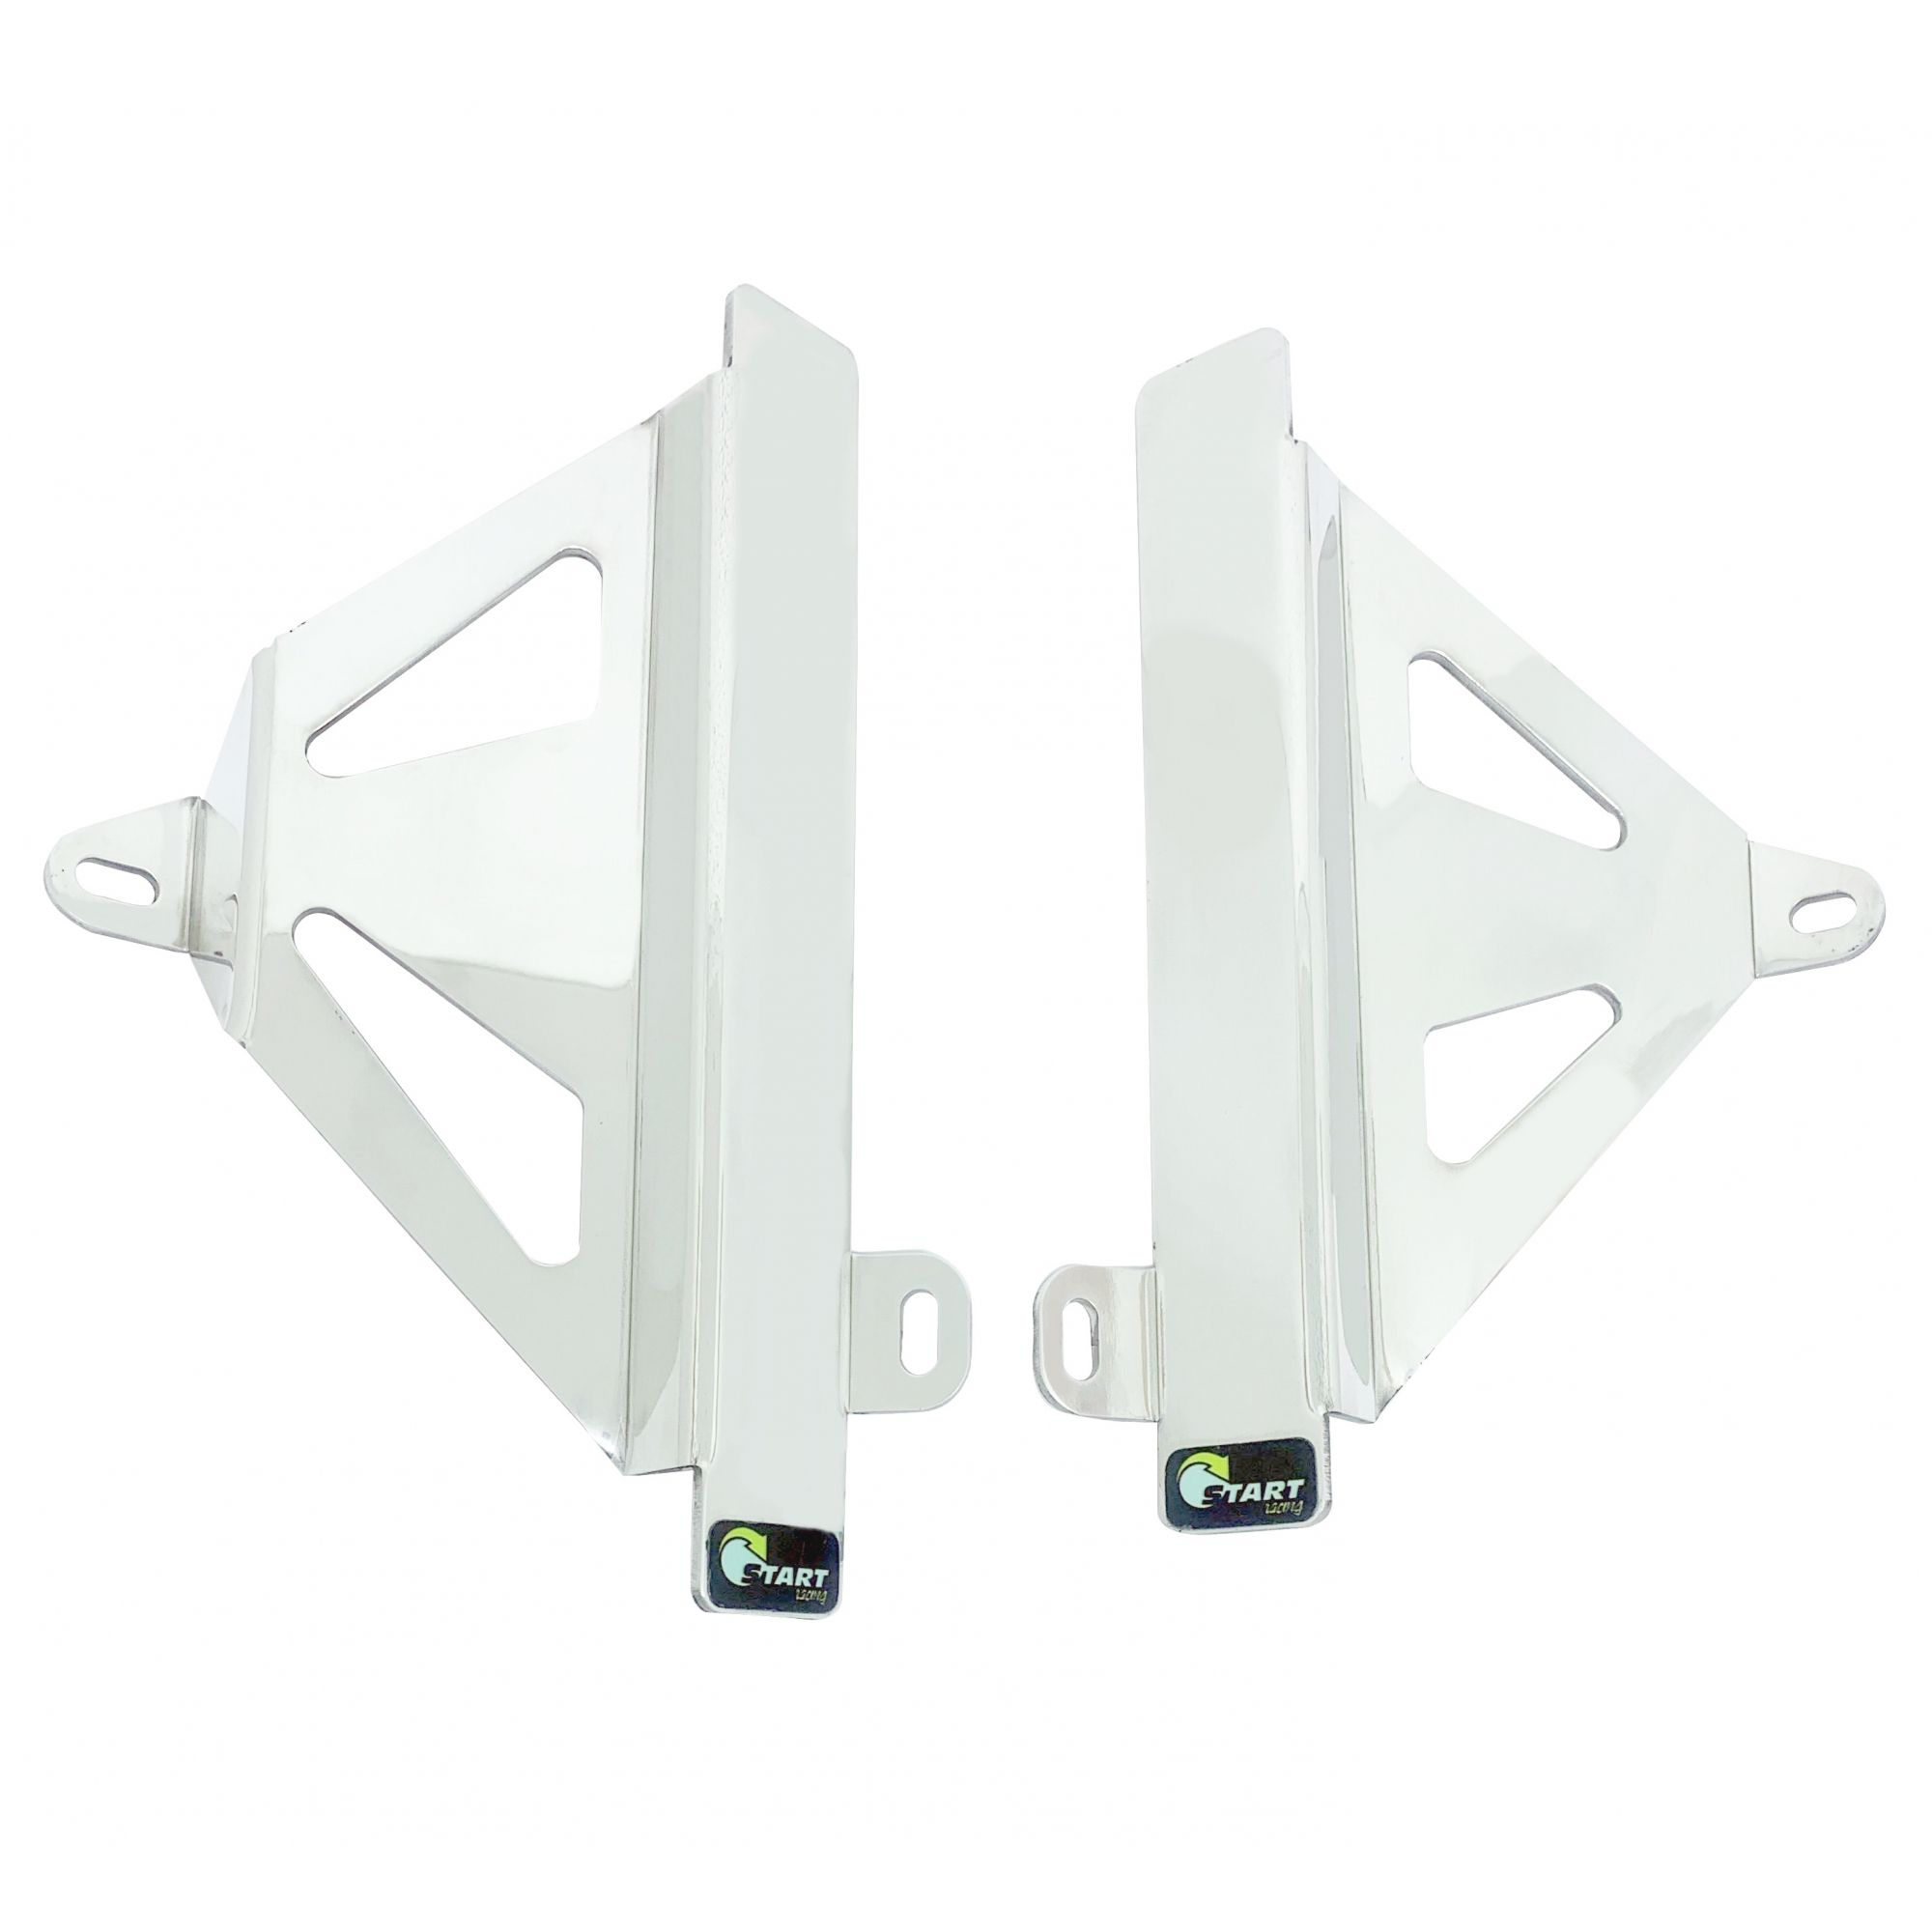 Protetor Radiador Start Mx Crf 450r 2009 a 2012